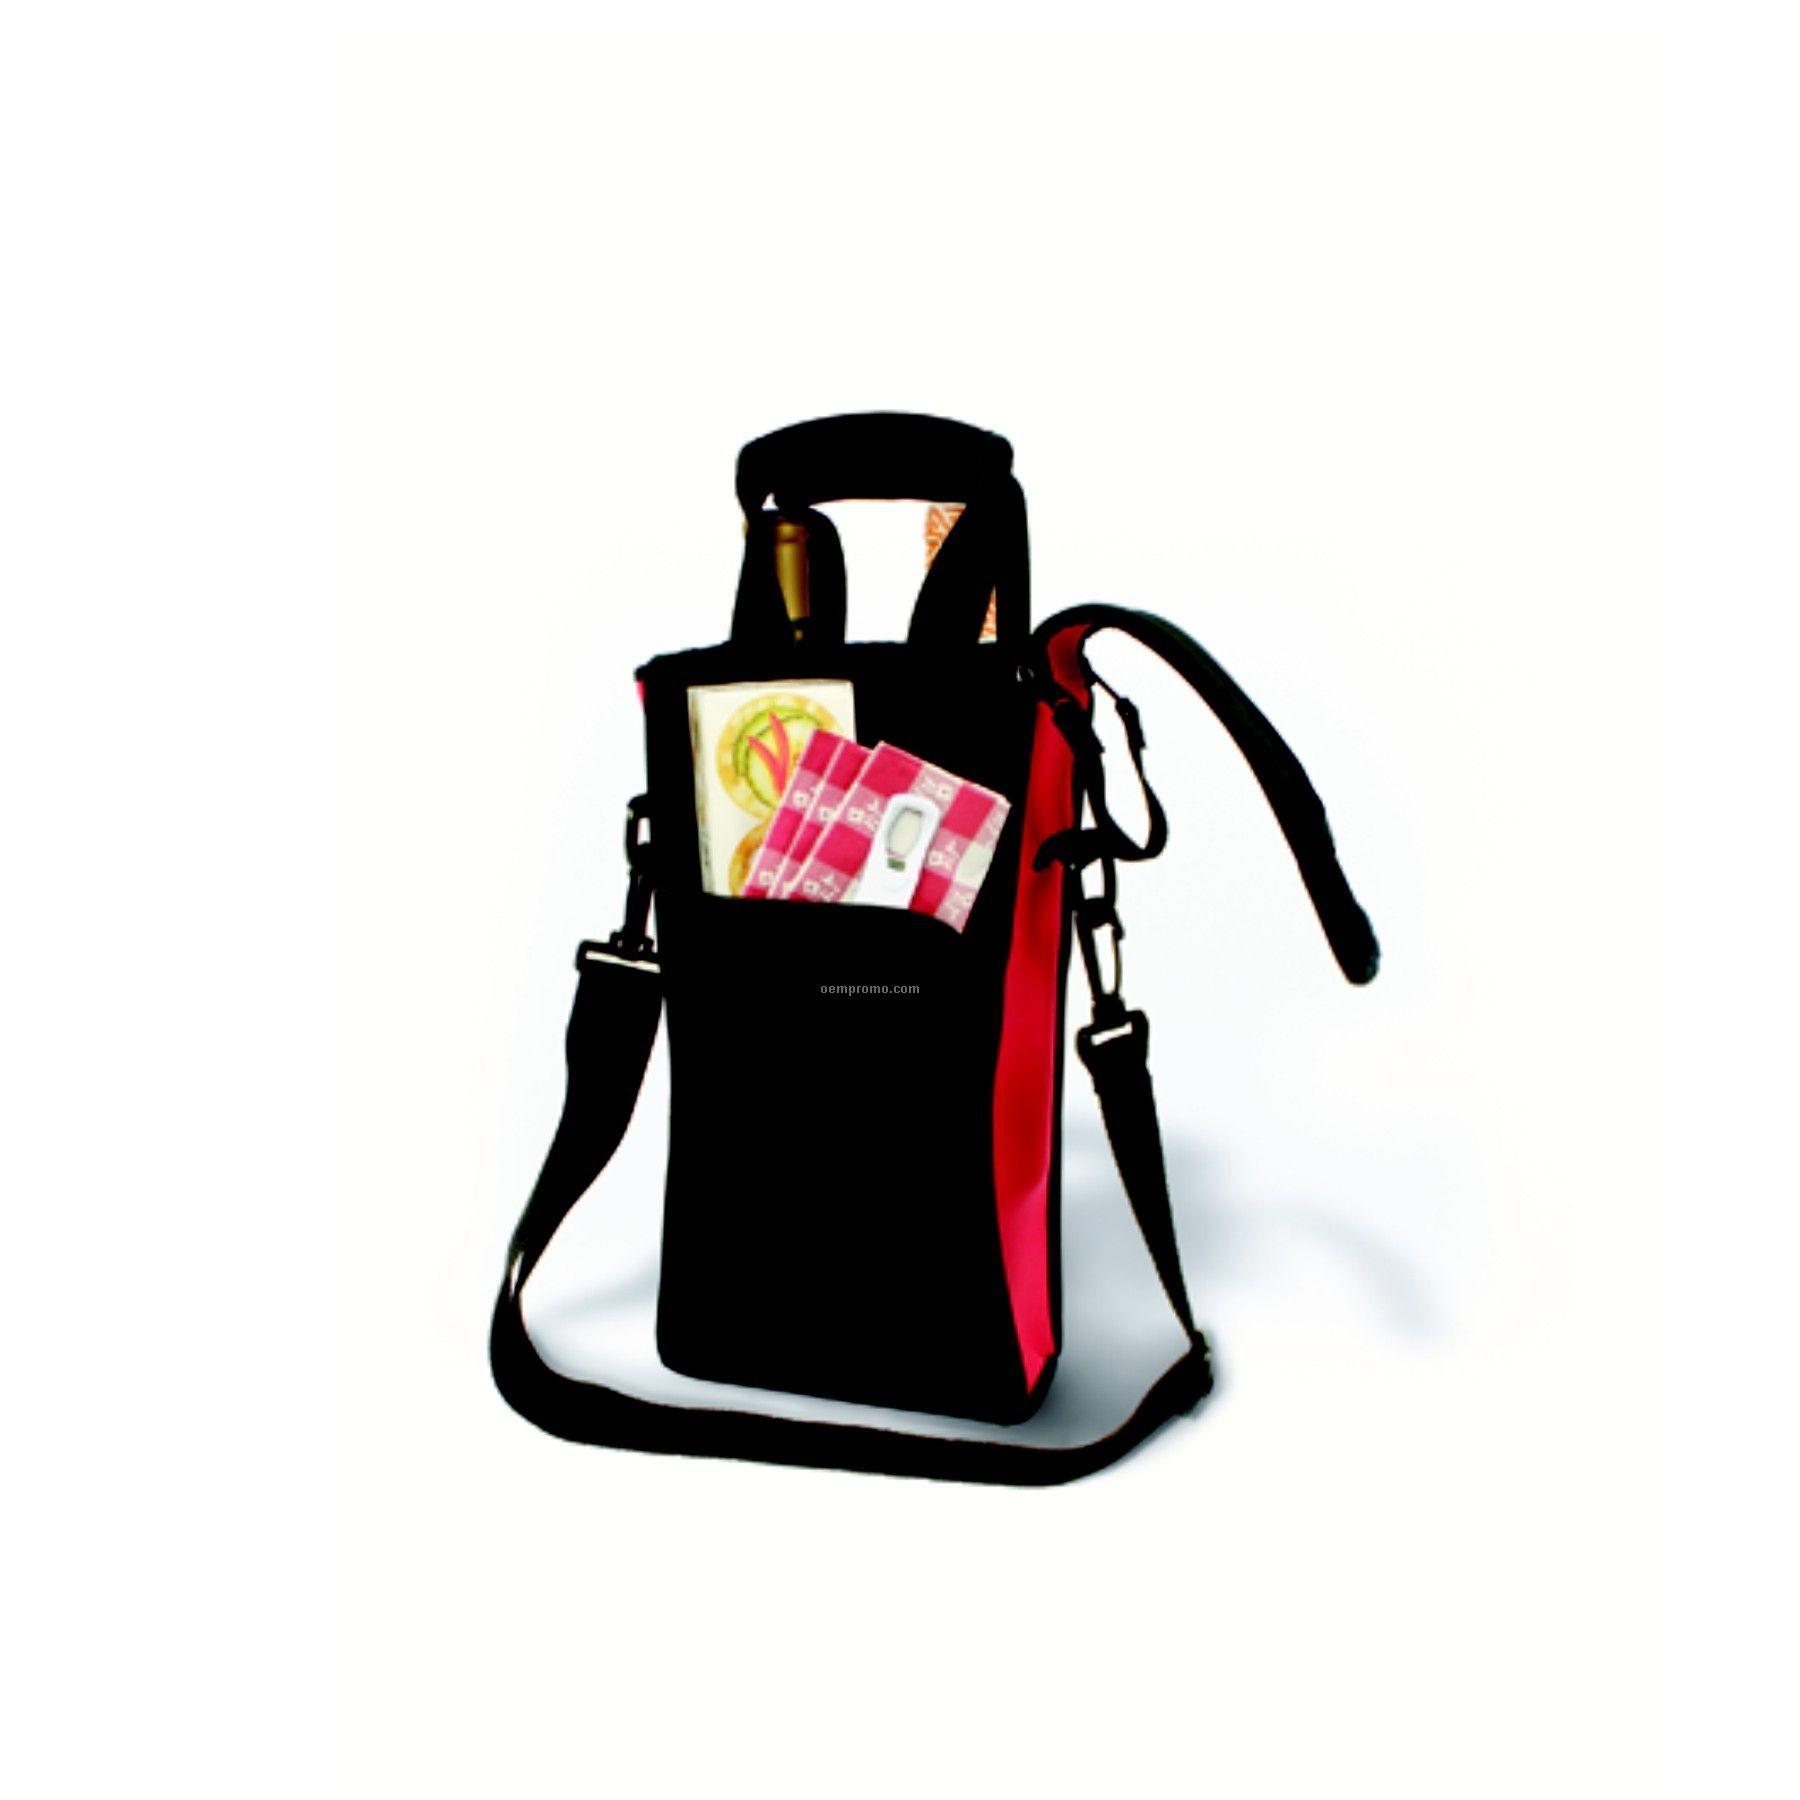 Zip-n-go Picnic Neoprene Two-bottle Tote Bag- Boxed